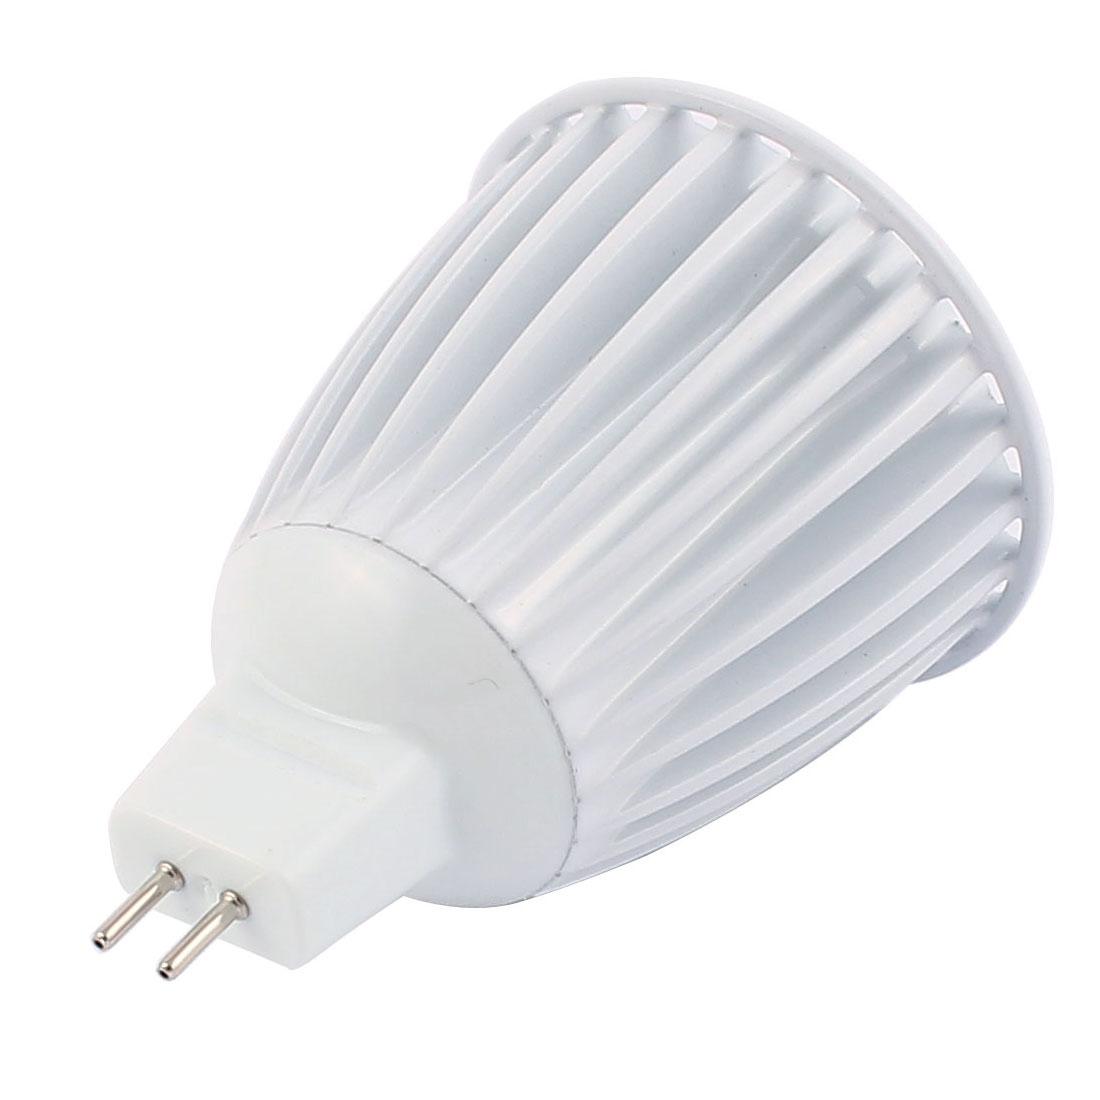 DC12V-7W-Ultra-Bright-MR16-COB-LED-Spotlight-Lamp-Bulb-Downlight-Pure-White